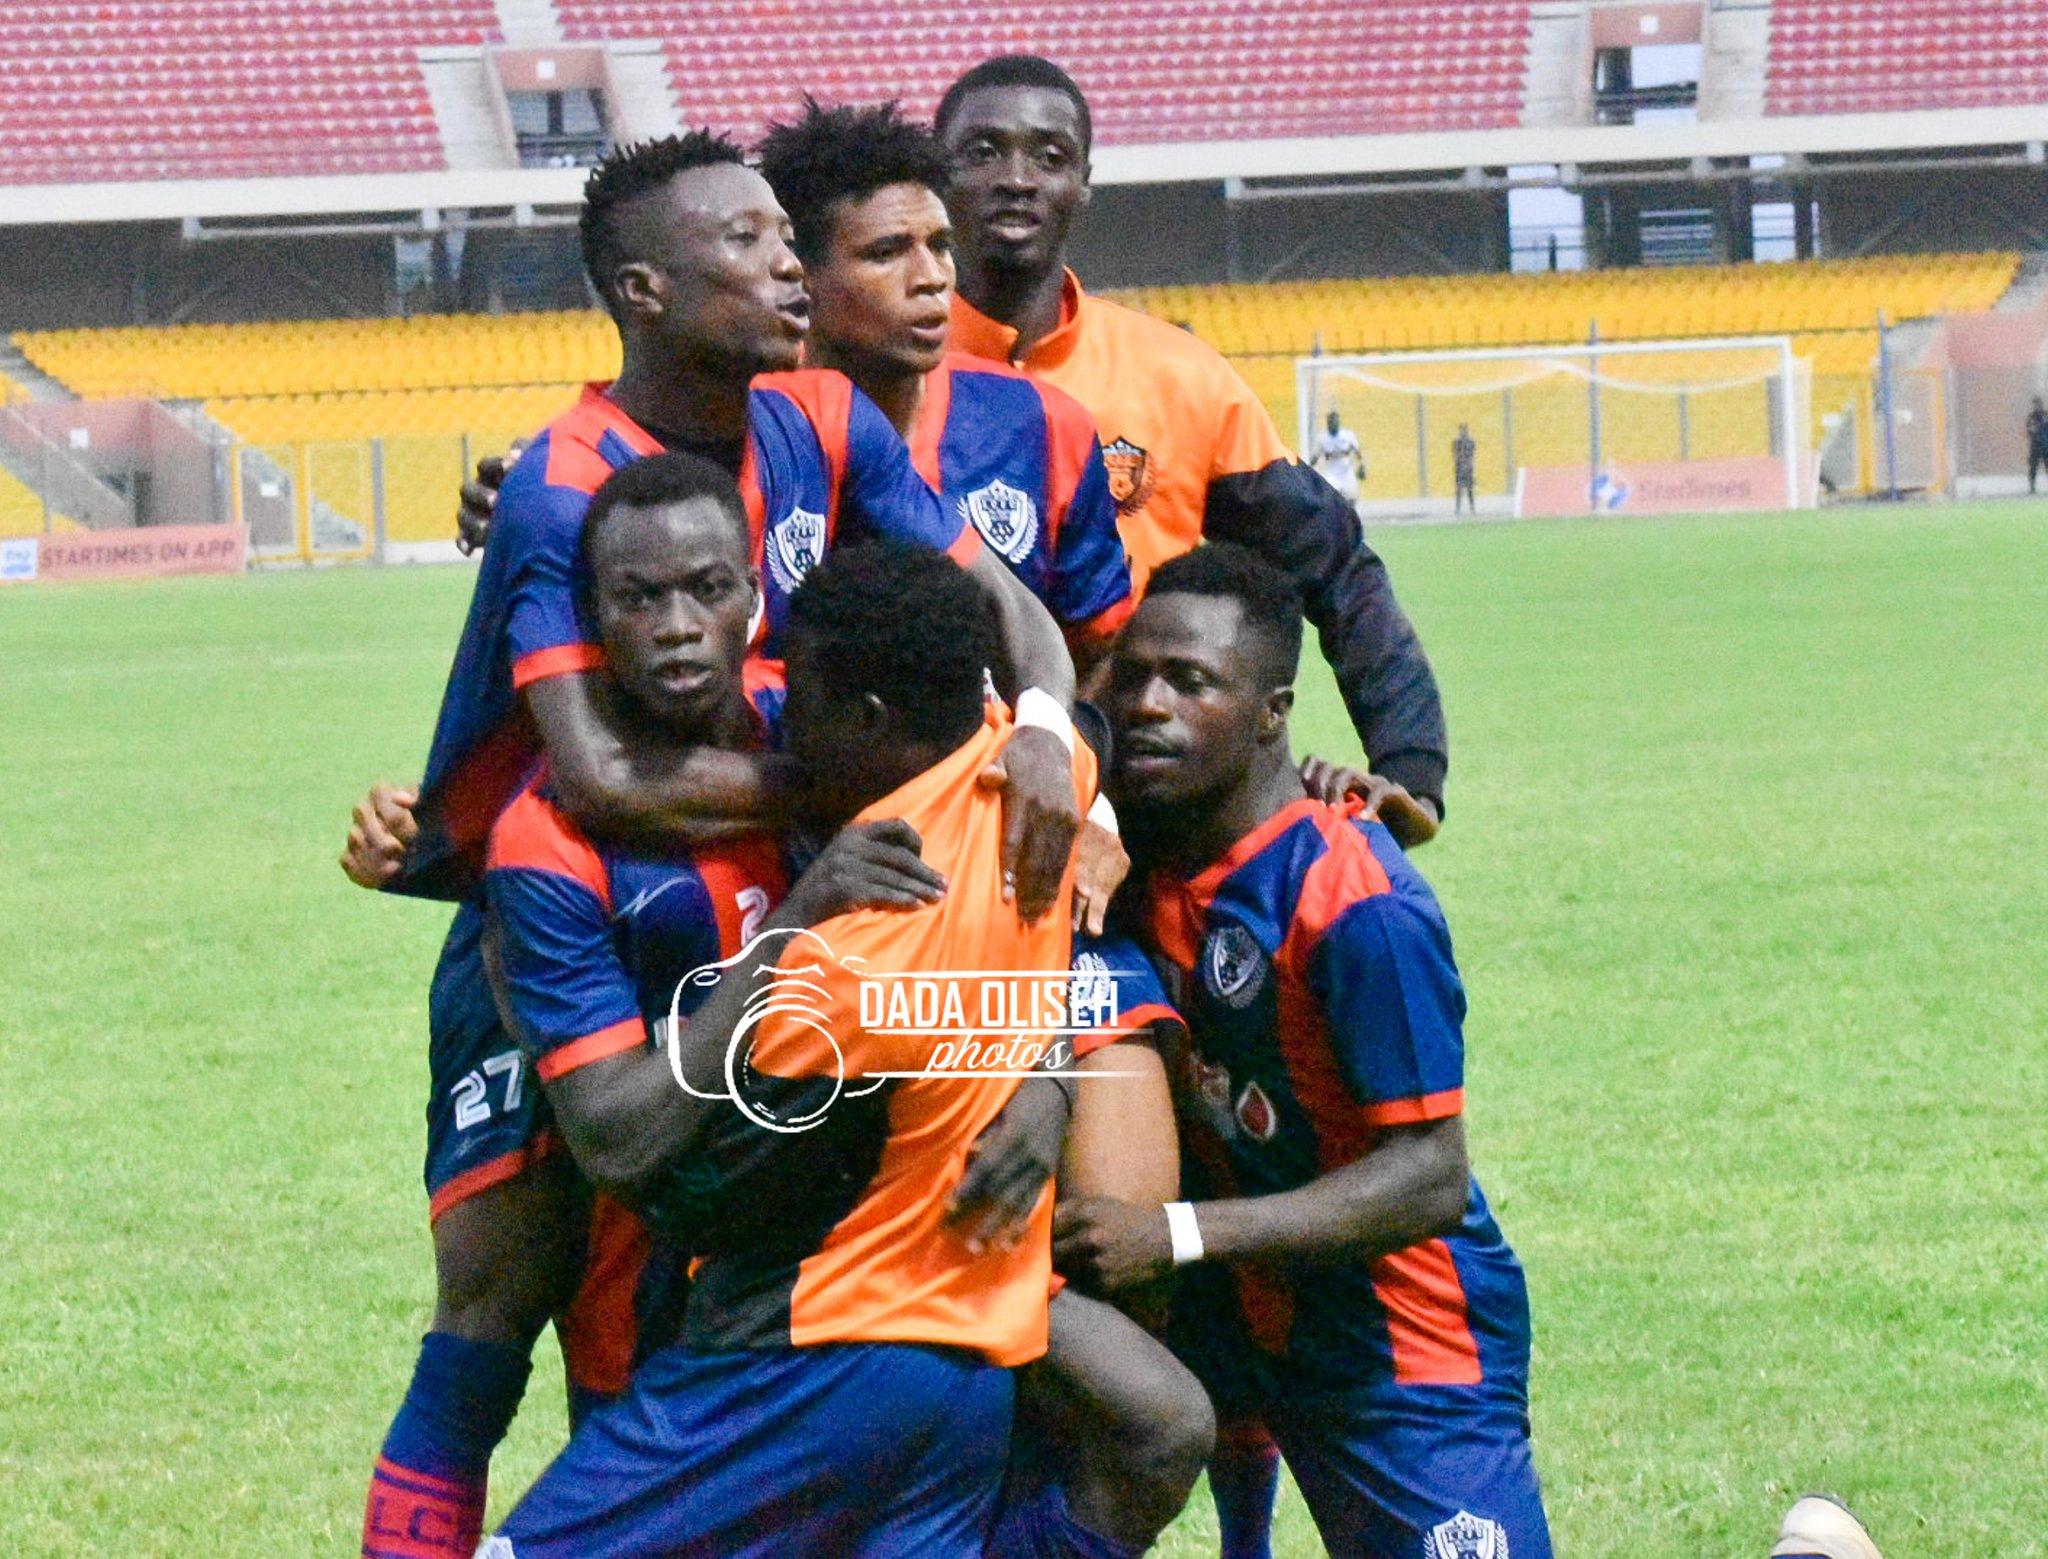 2019/20 Ghana Premier League Match Week 6 Report: Legon Cities FC 1-0 Bechem United